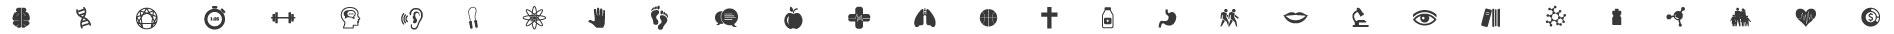 Álex Cavalcante Neuropsicoterapeuta Psicanalista Mentoria Clínica Método Live Terapeuta Ansiedade Depressão Estresse Pulsões Terapia Psicanálise Psicólogo Eneagrama Medos Desejos Florianópolis São Paulo Paulista Catarinense